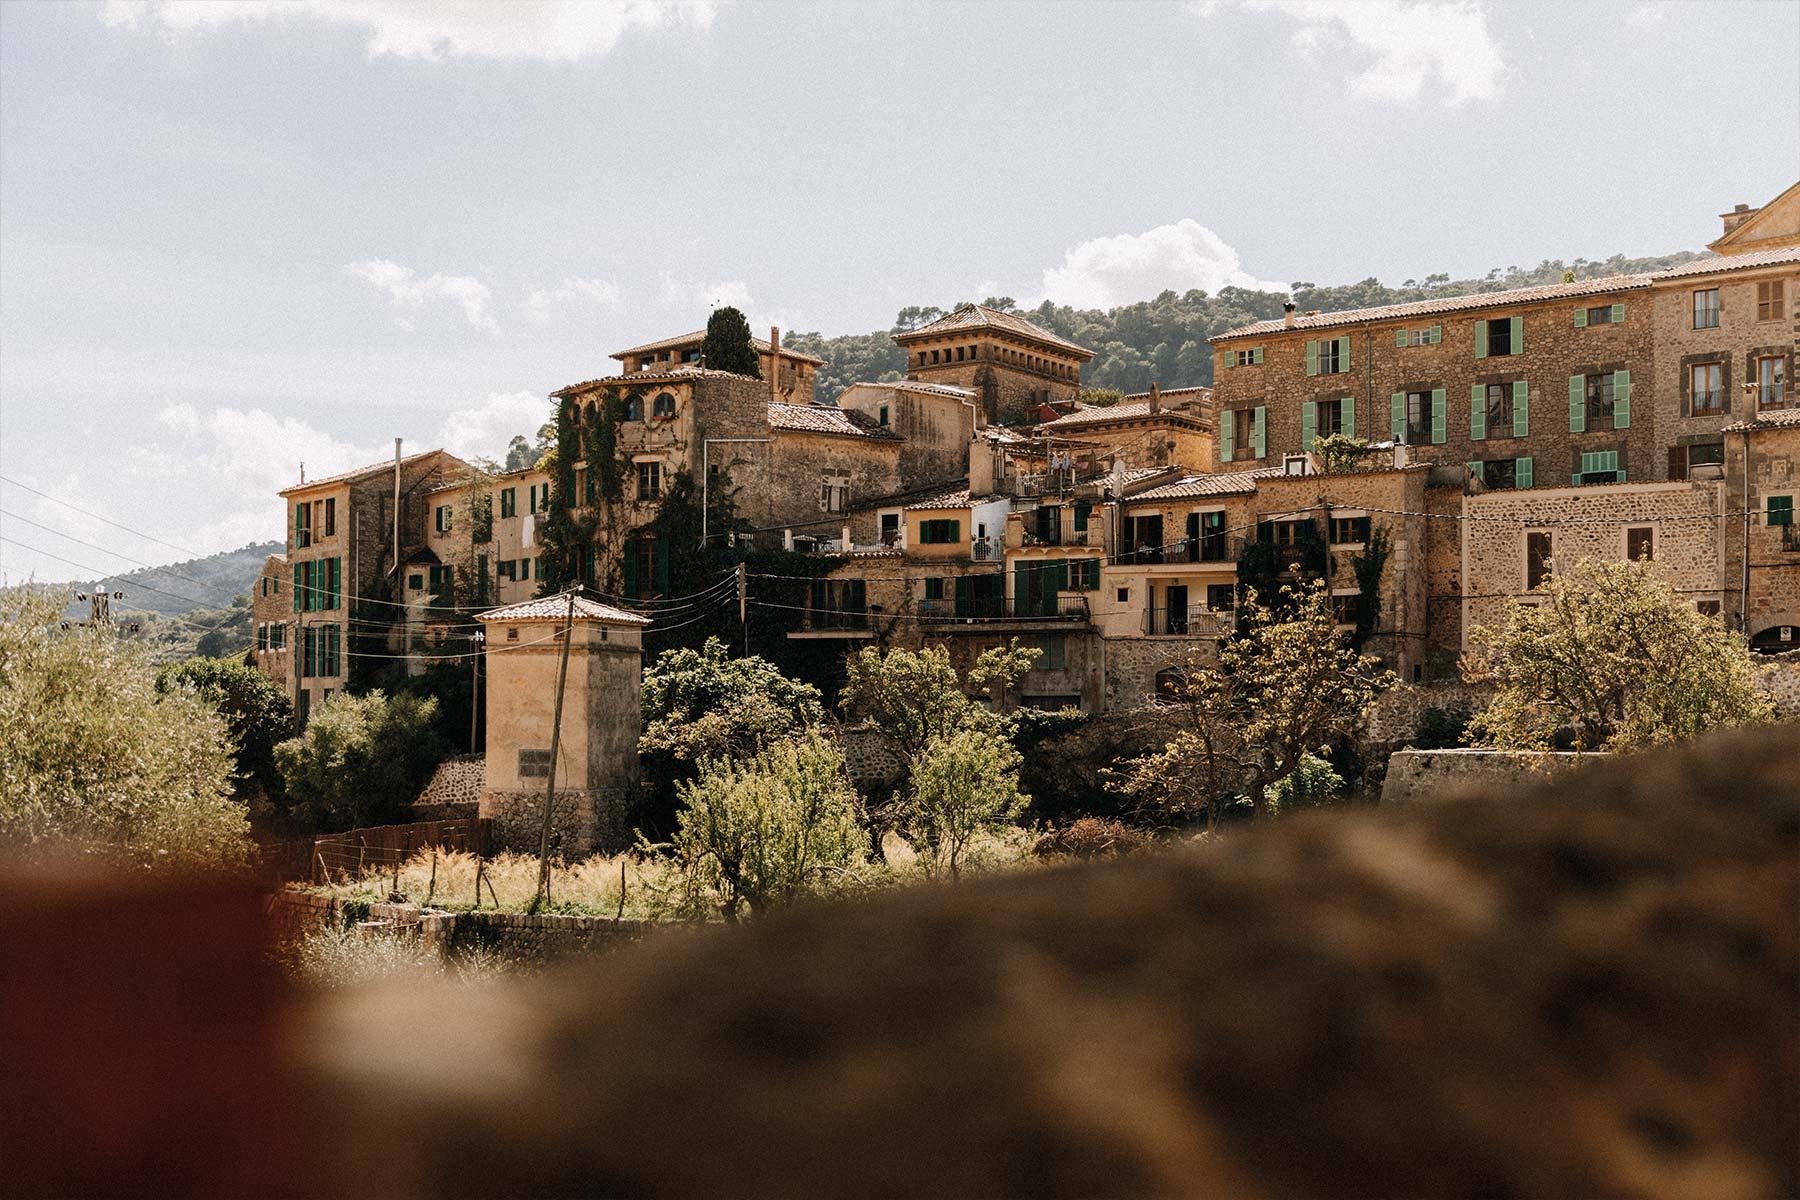 Travel-Photography-Bildreportage-Mallorca-Spain-Vacation-Basti-Kaspar_valldemossa